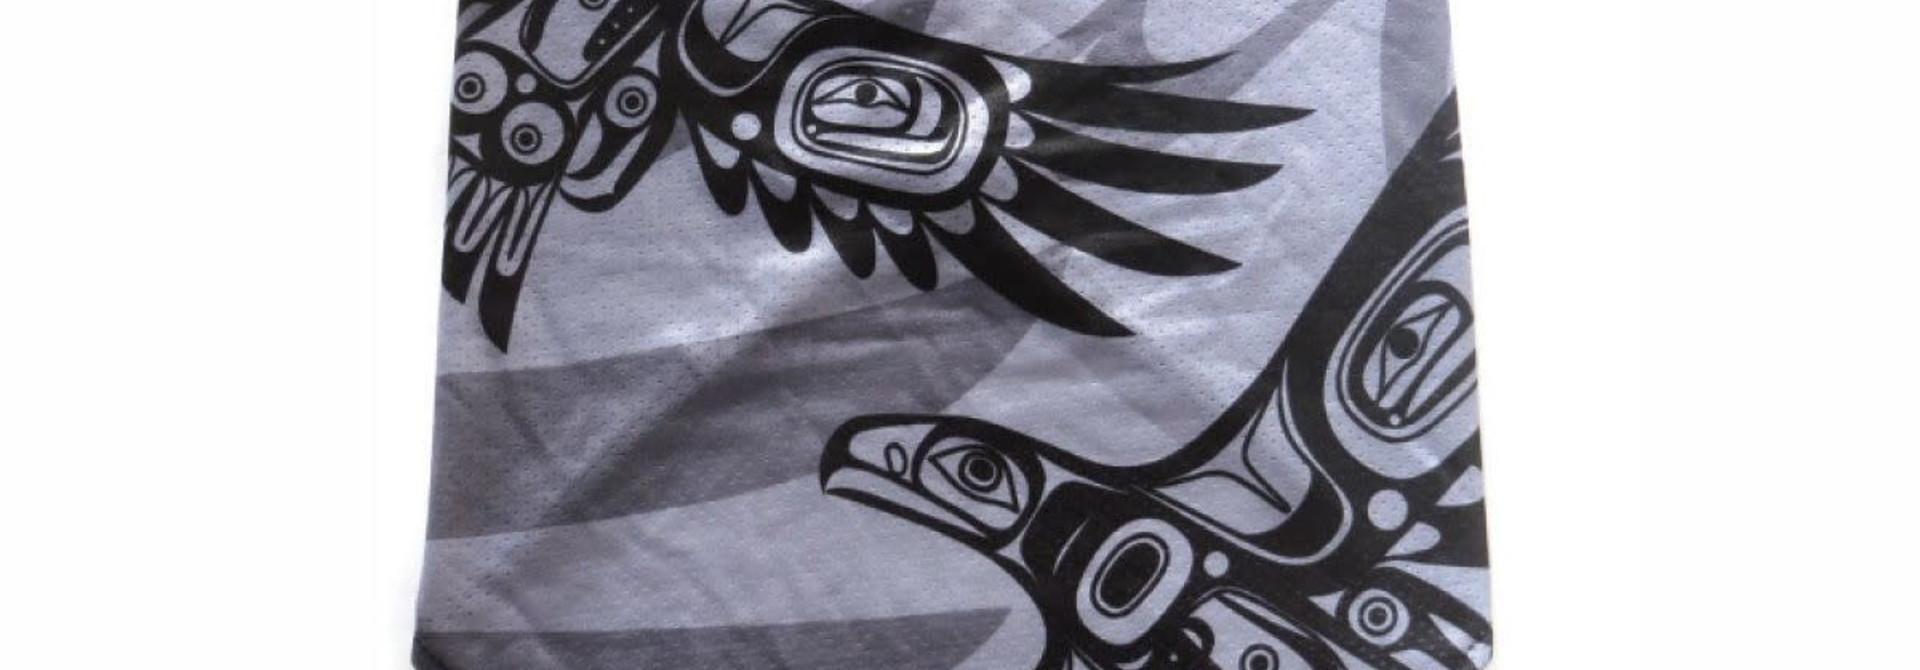 Bandana Gaiters with Ear loops -Soaring Eagle by Corey Bulpitt